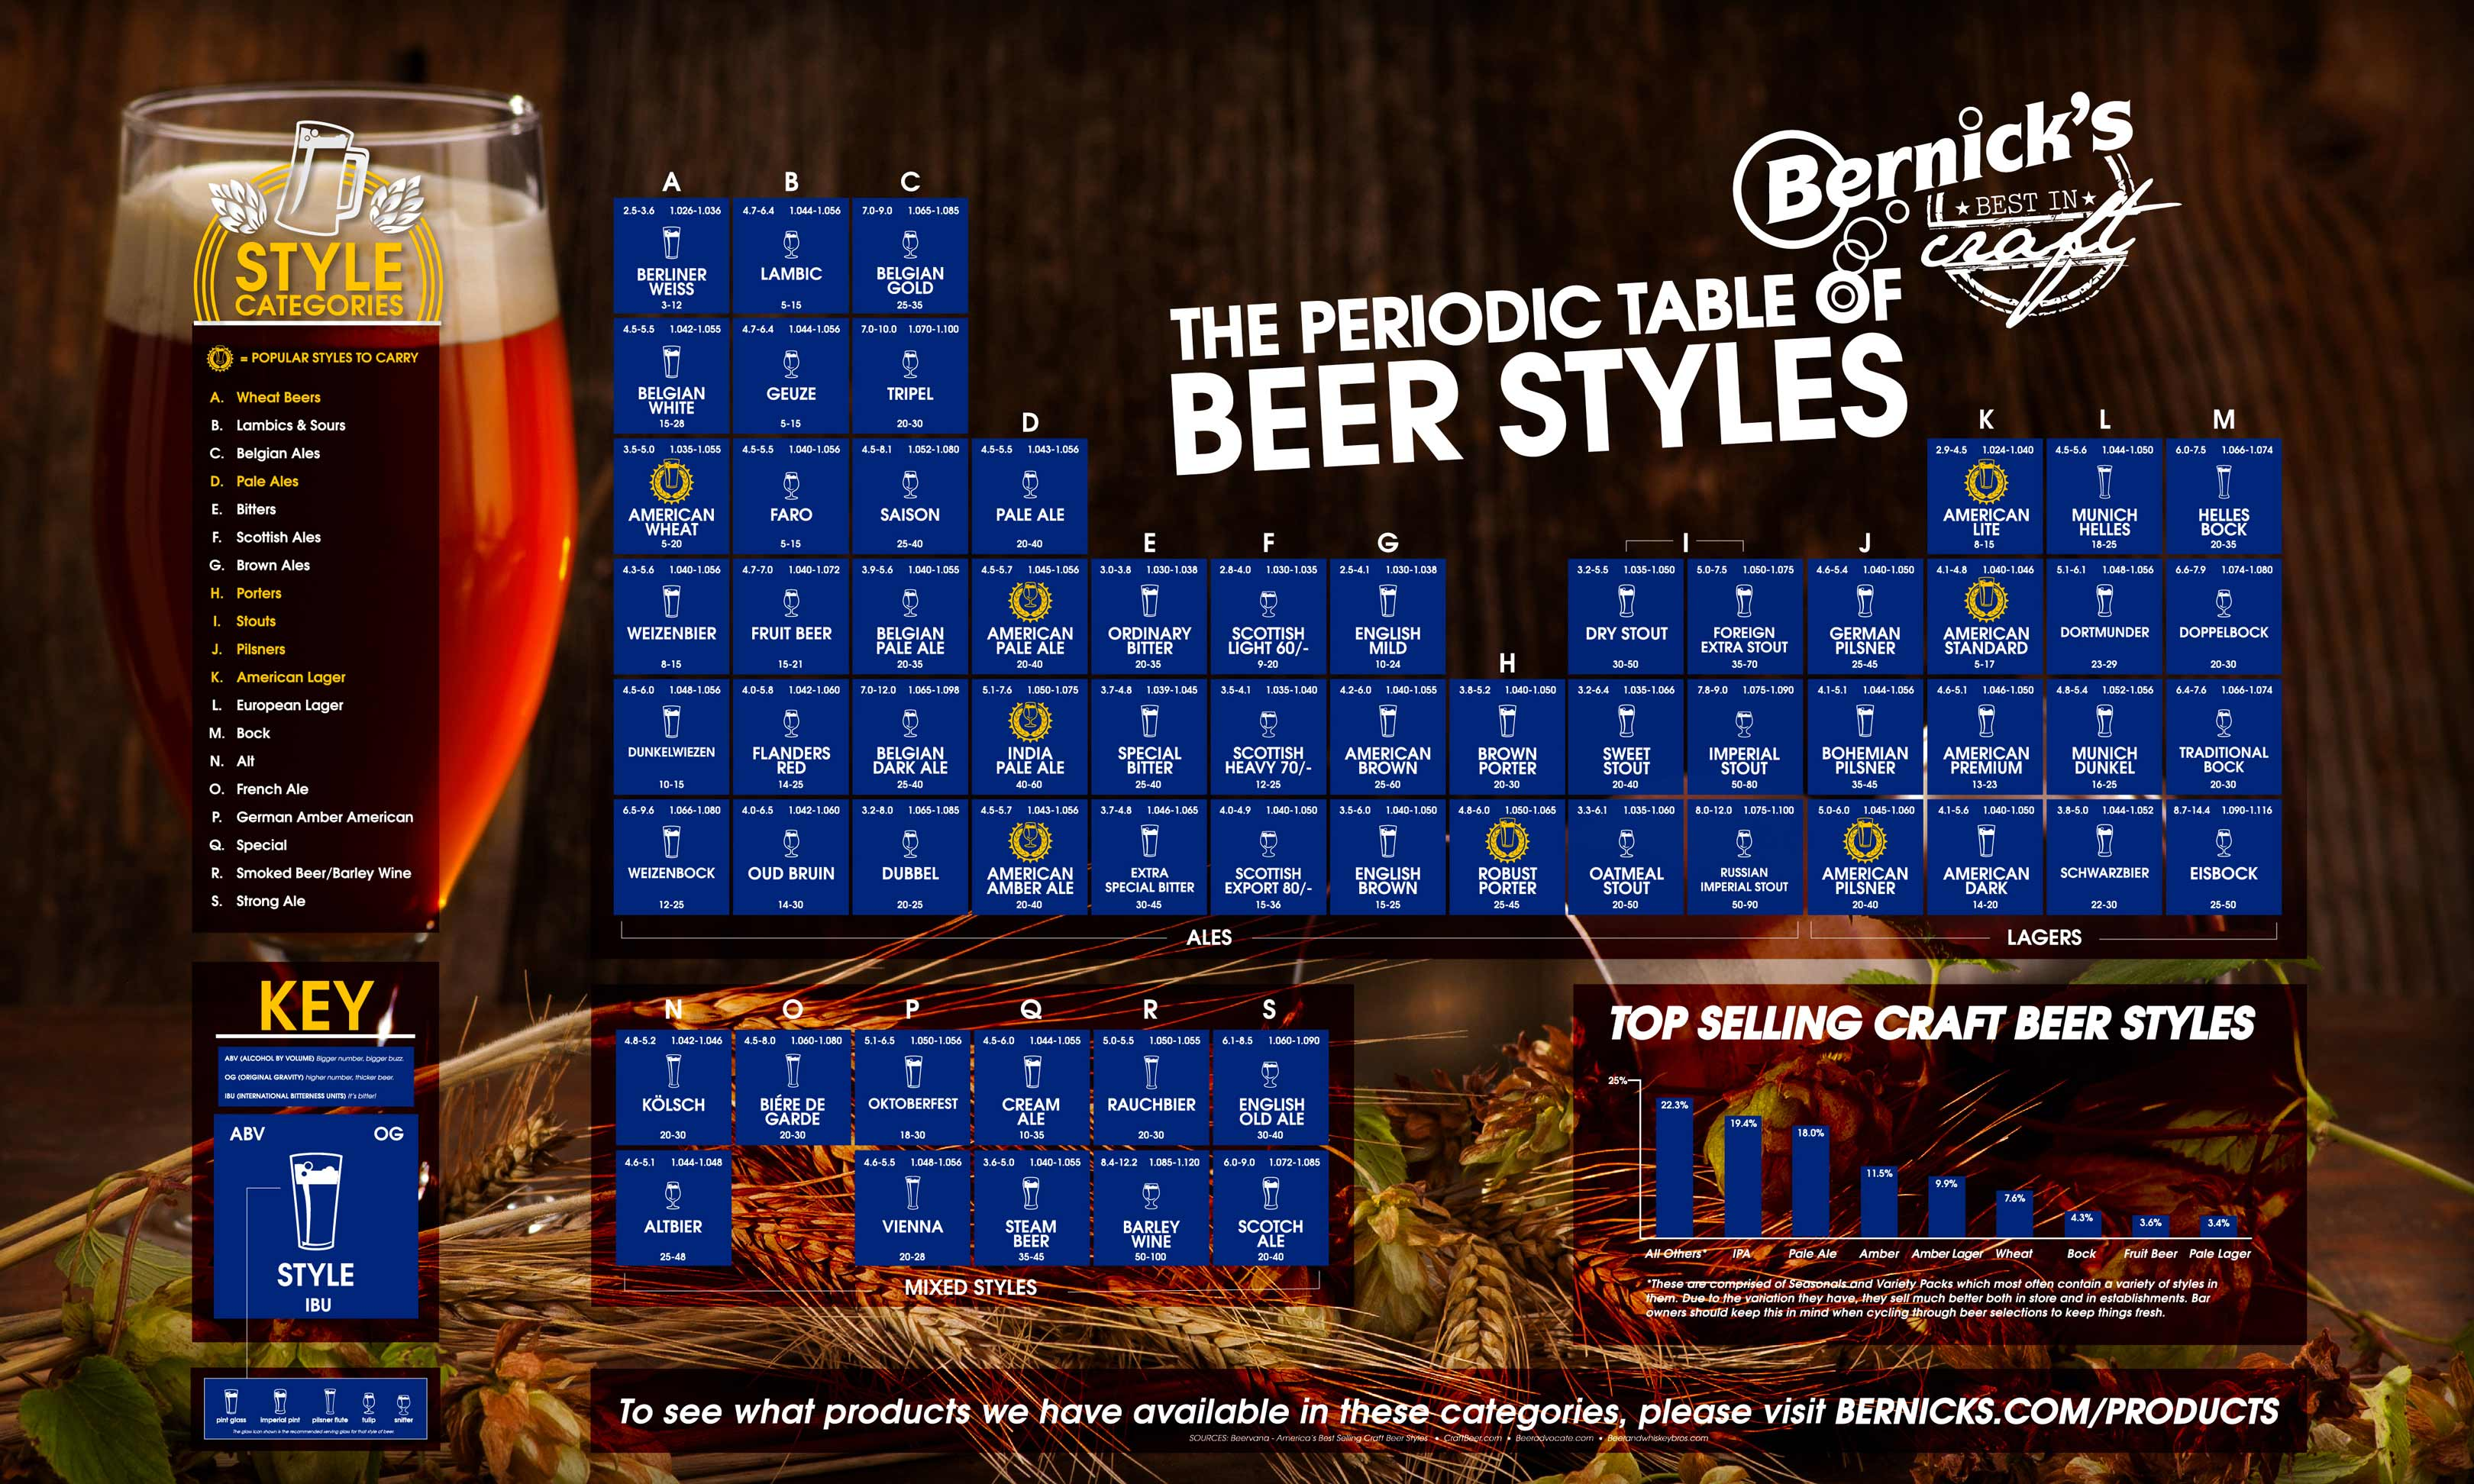 Bernicks-Craft-Beer-Periodic-Table-WEB